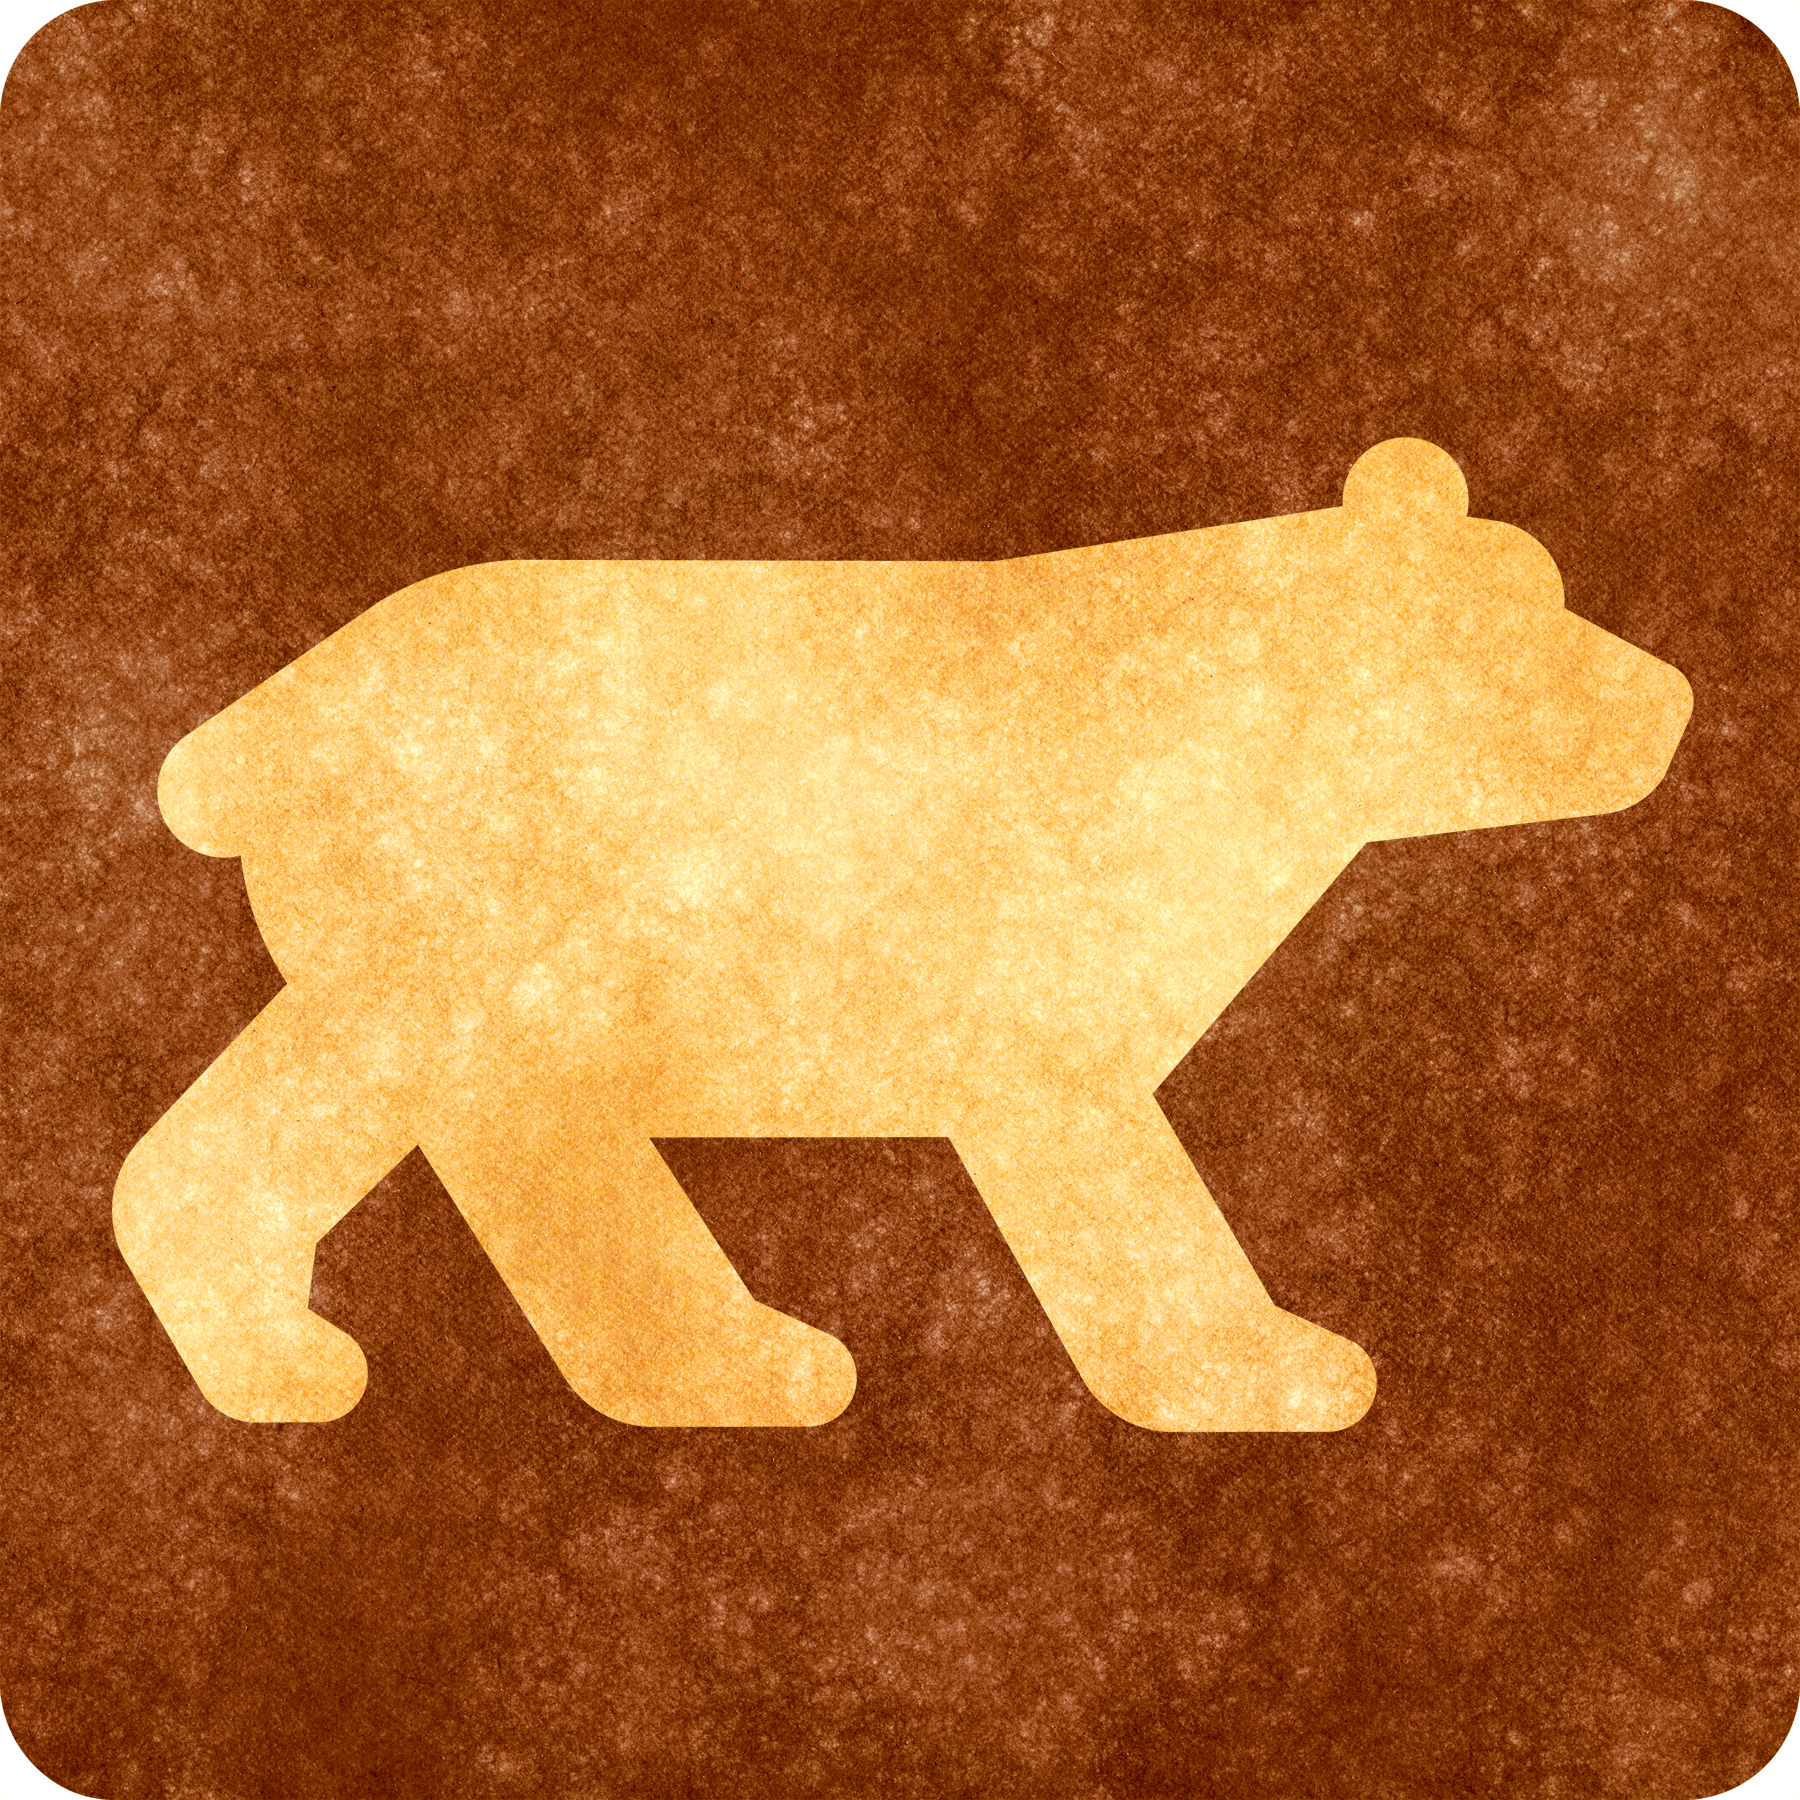 Sepia grunge sign - bear viewing photo